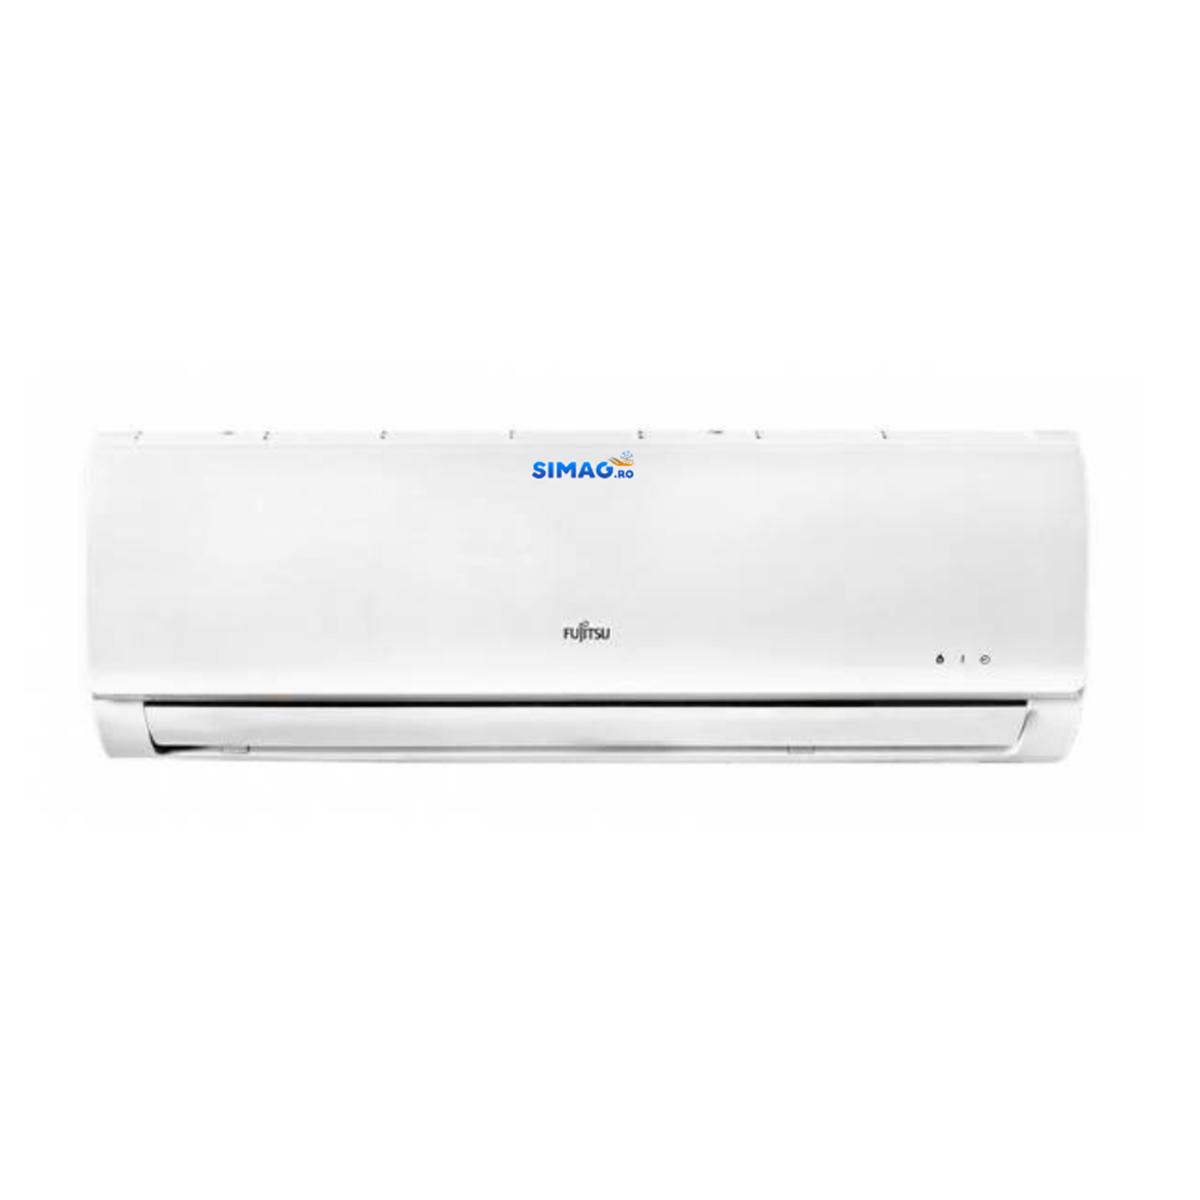 Aparat de aer conditionat tip split Fujitsu ASYG24KLCA-AOYG24KLTA Inverter, R32, 24000 BTU 12